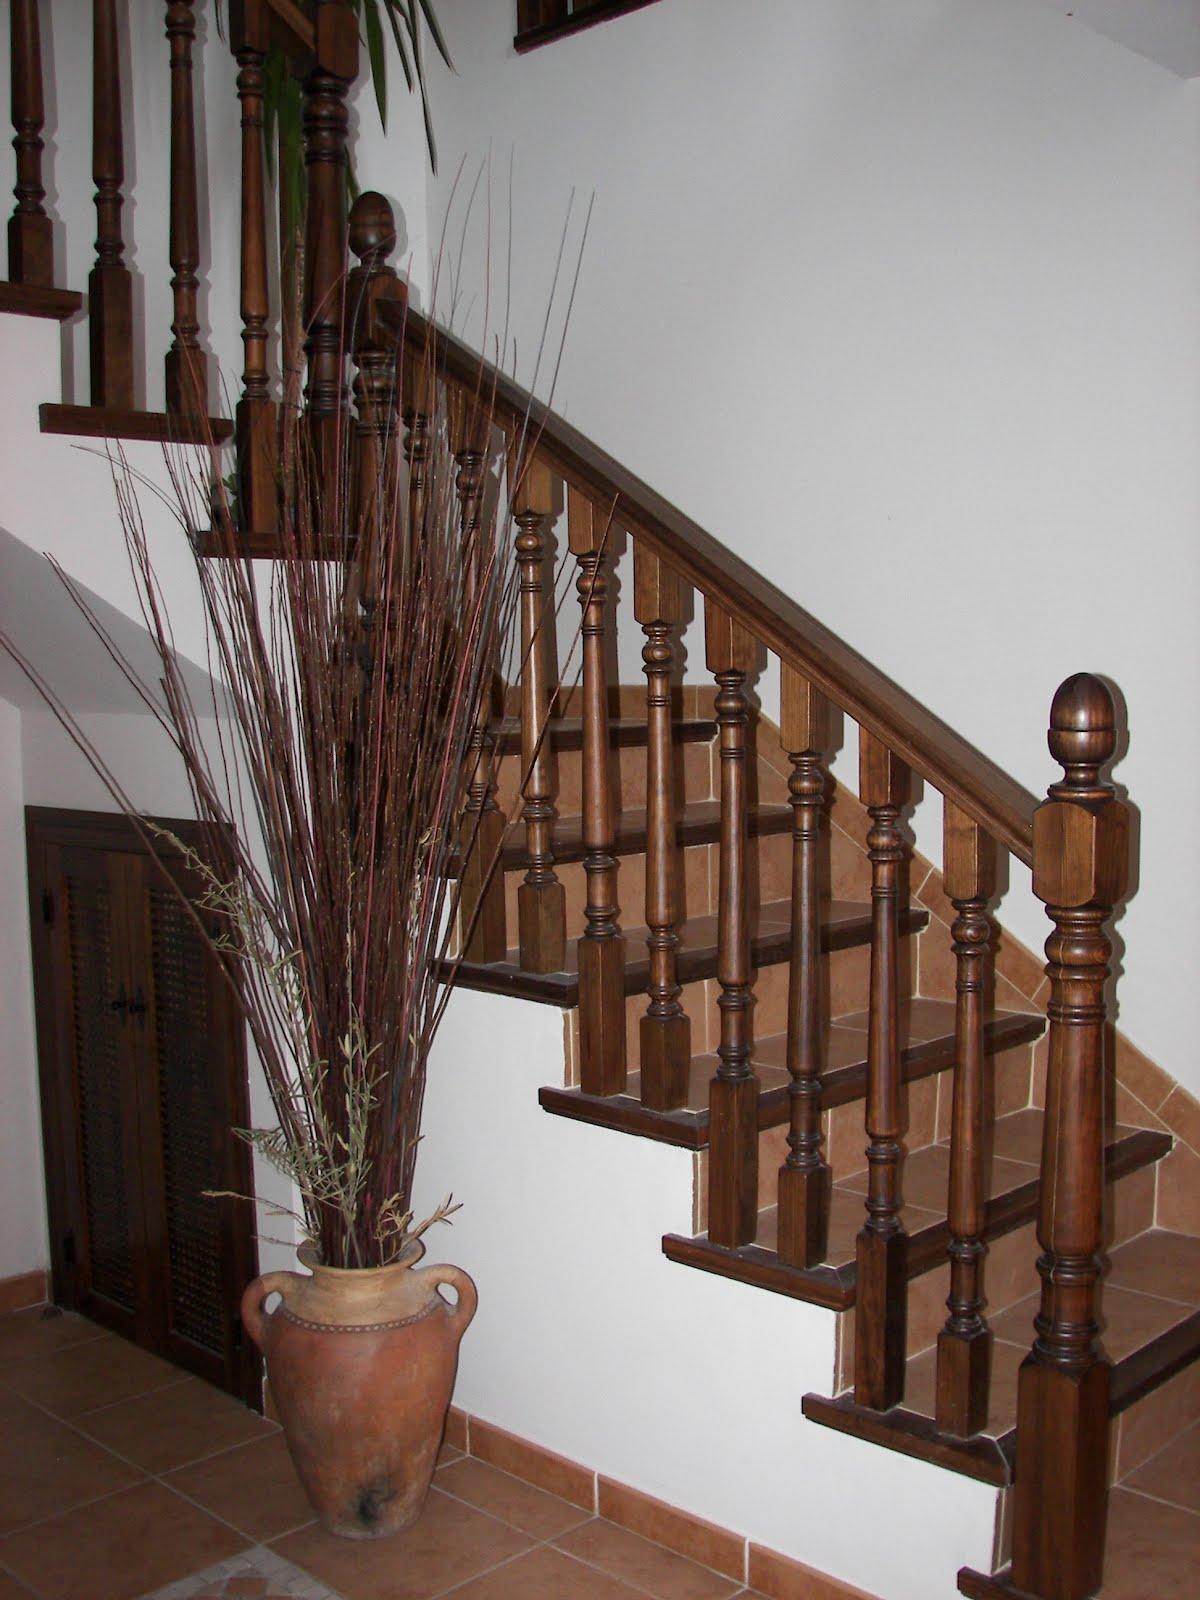 Barandas pasamanos y pilares de madera para escaleras balcones - Baranda de madera ...